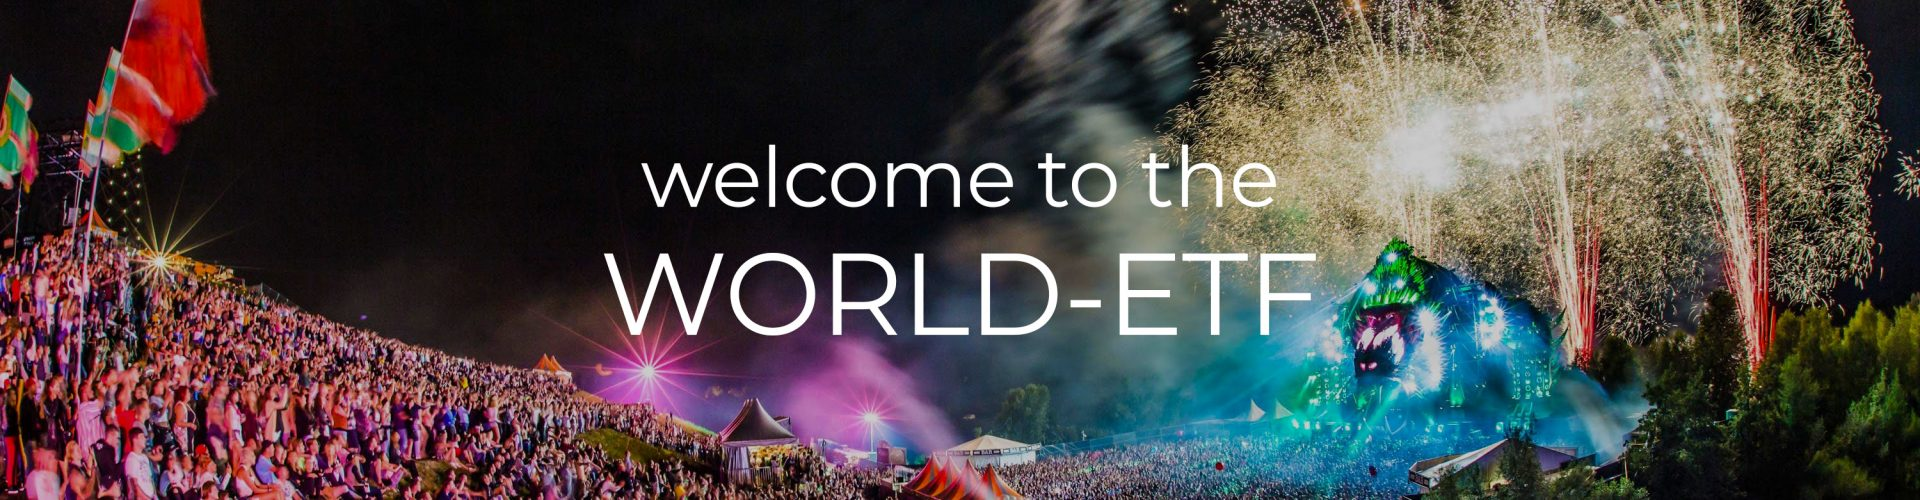 http://world-etf.org/wp-content/uploads/2019/01/3000x1688-header-banner-4-1920x500.jpg